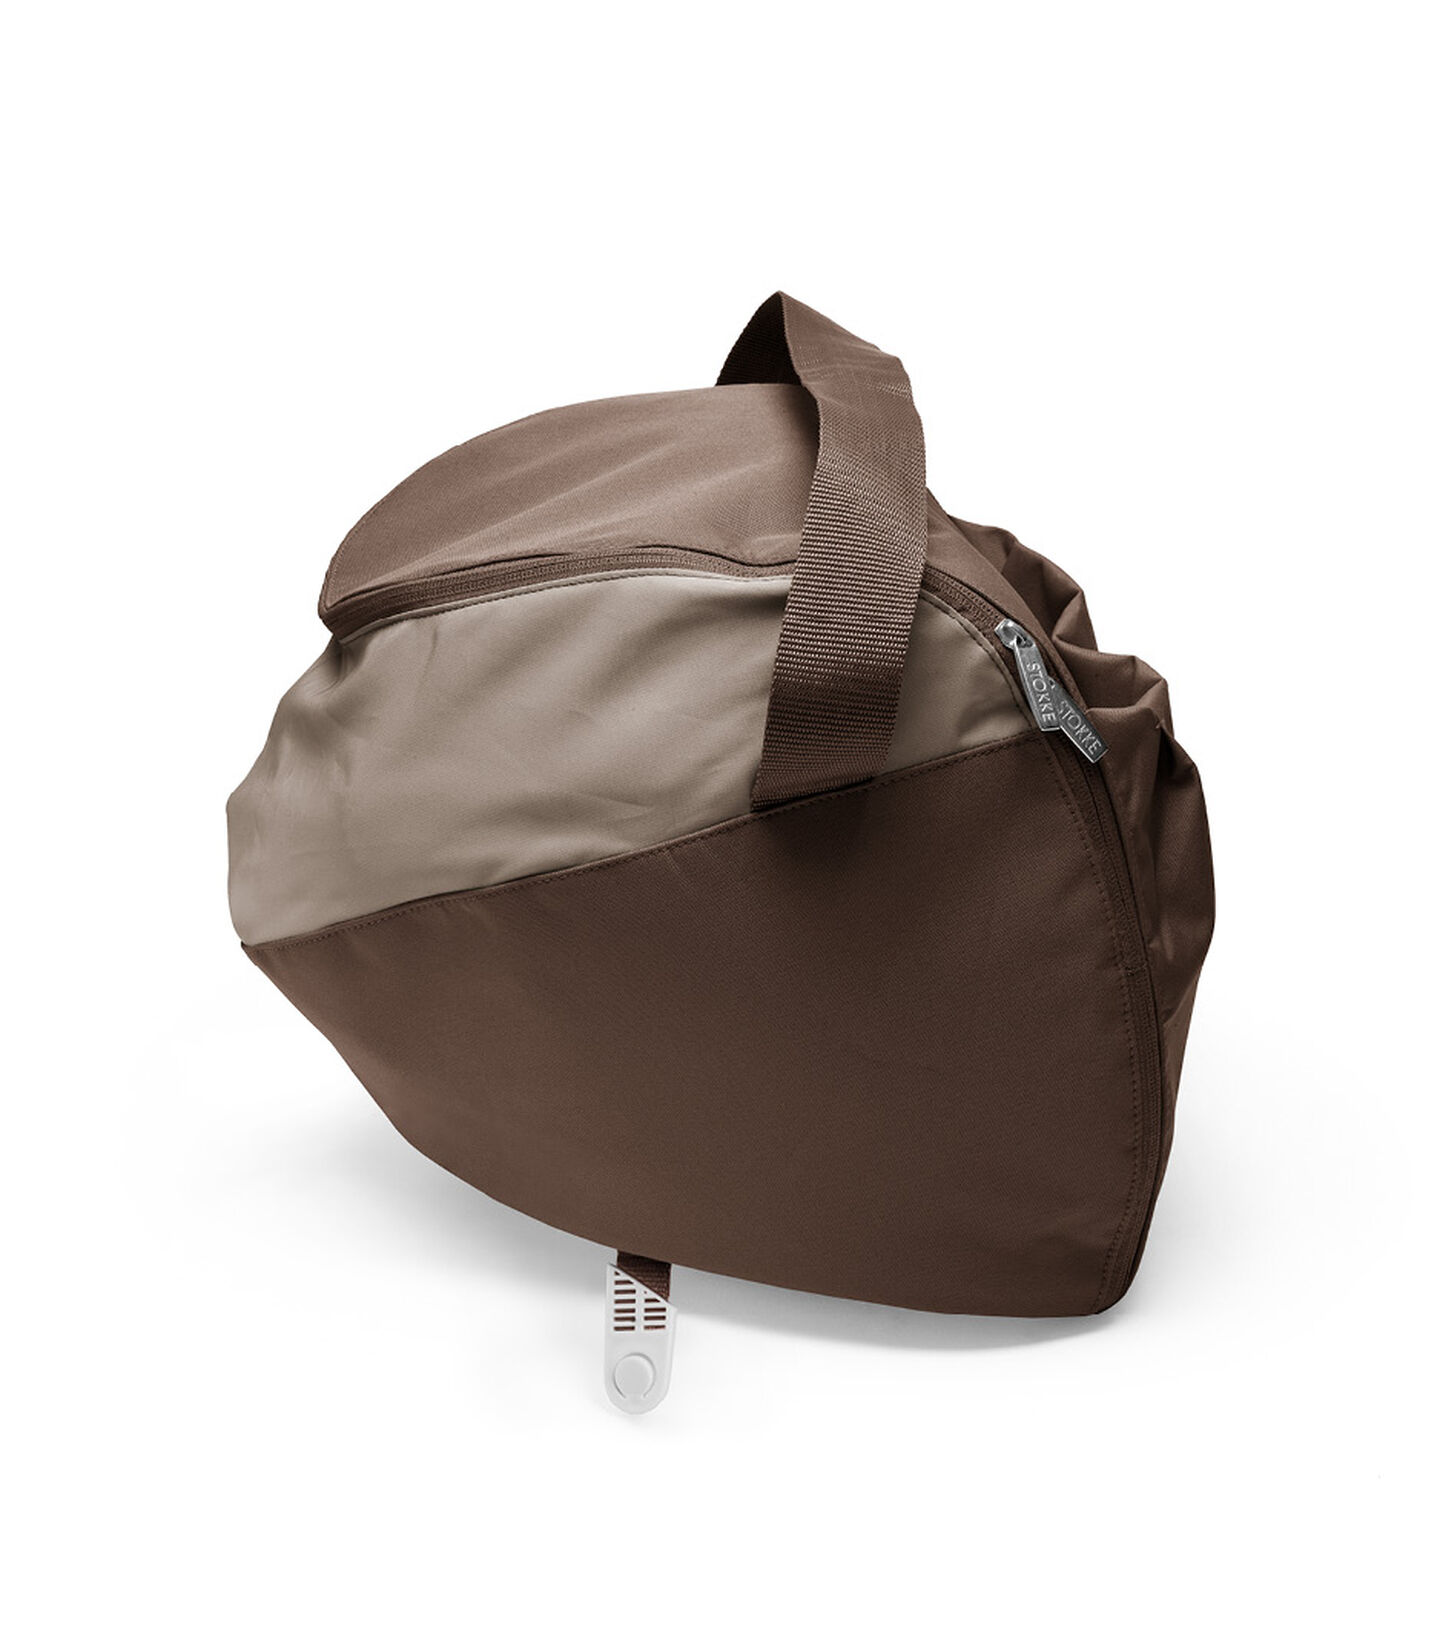 Stokke® Xplory® Shopping Bag Brown, Brown, mainview